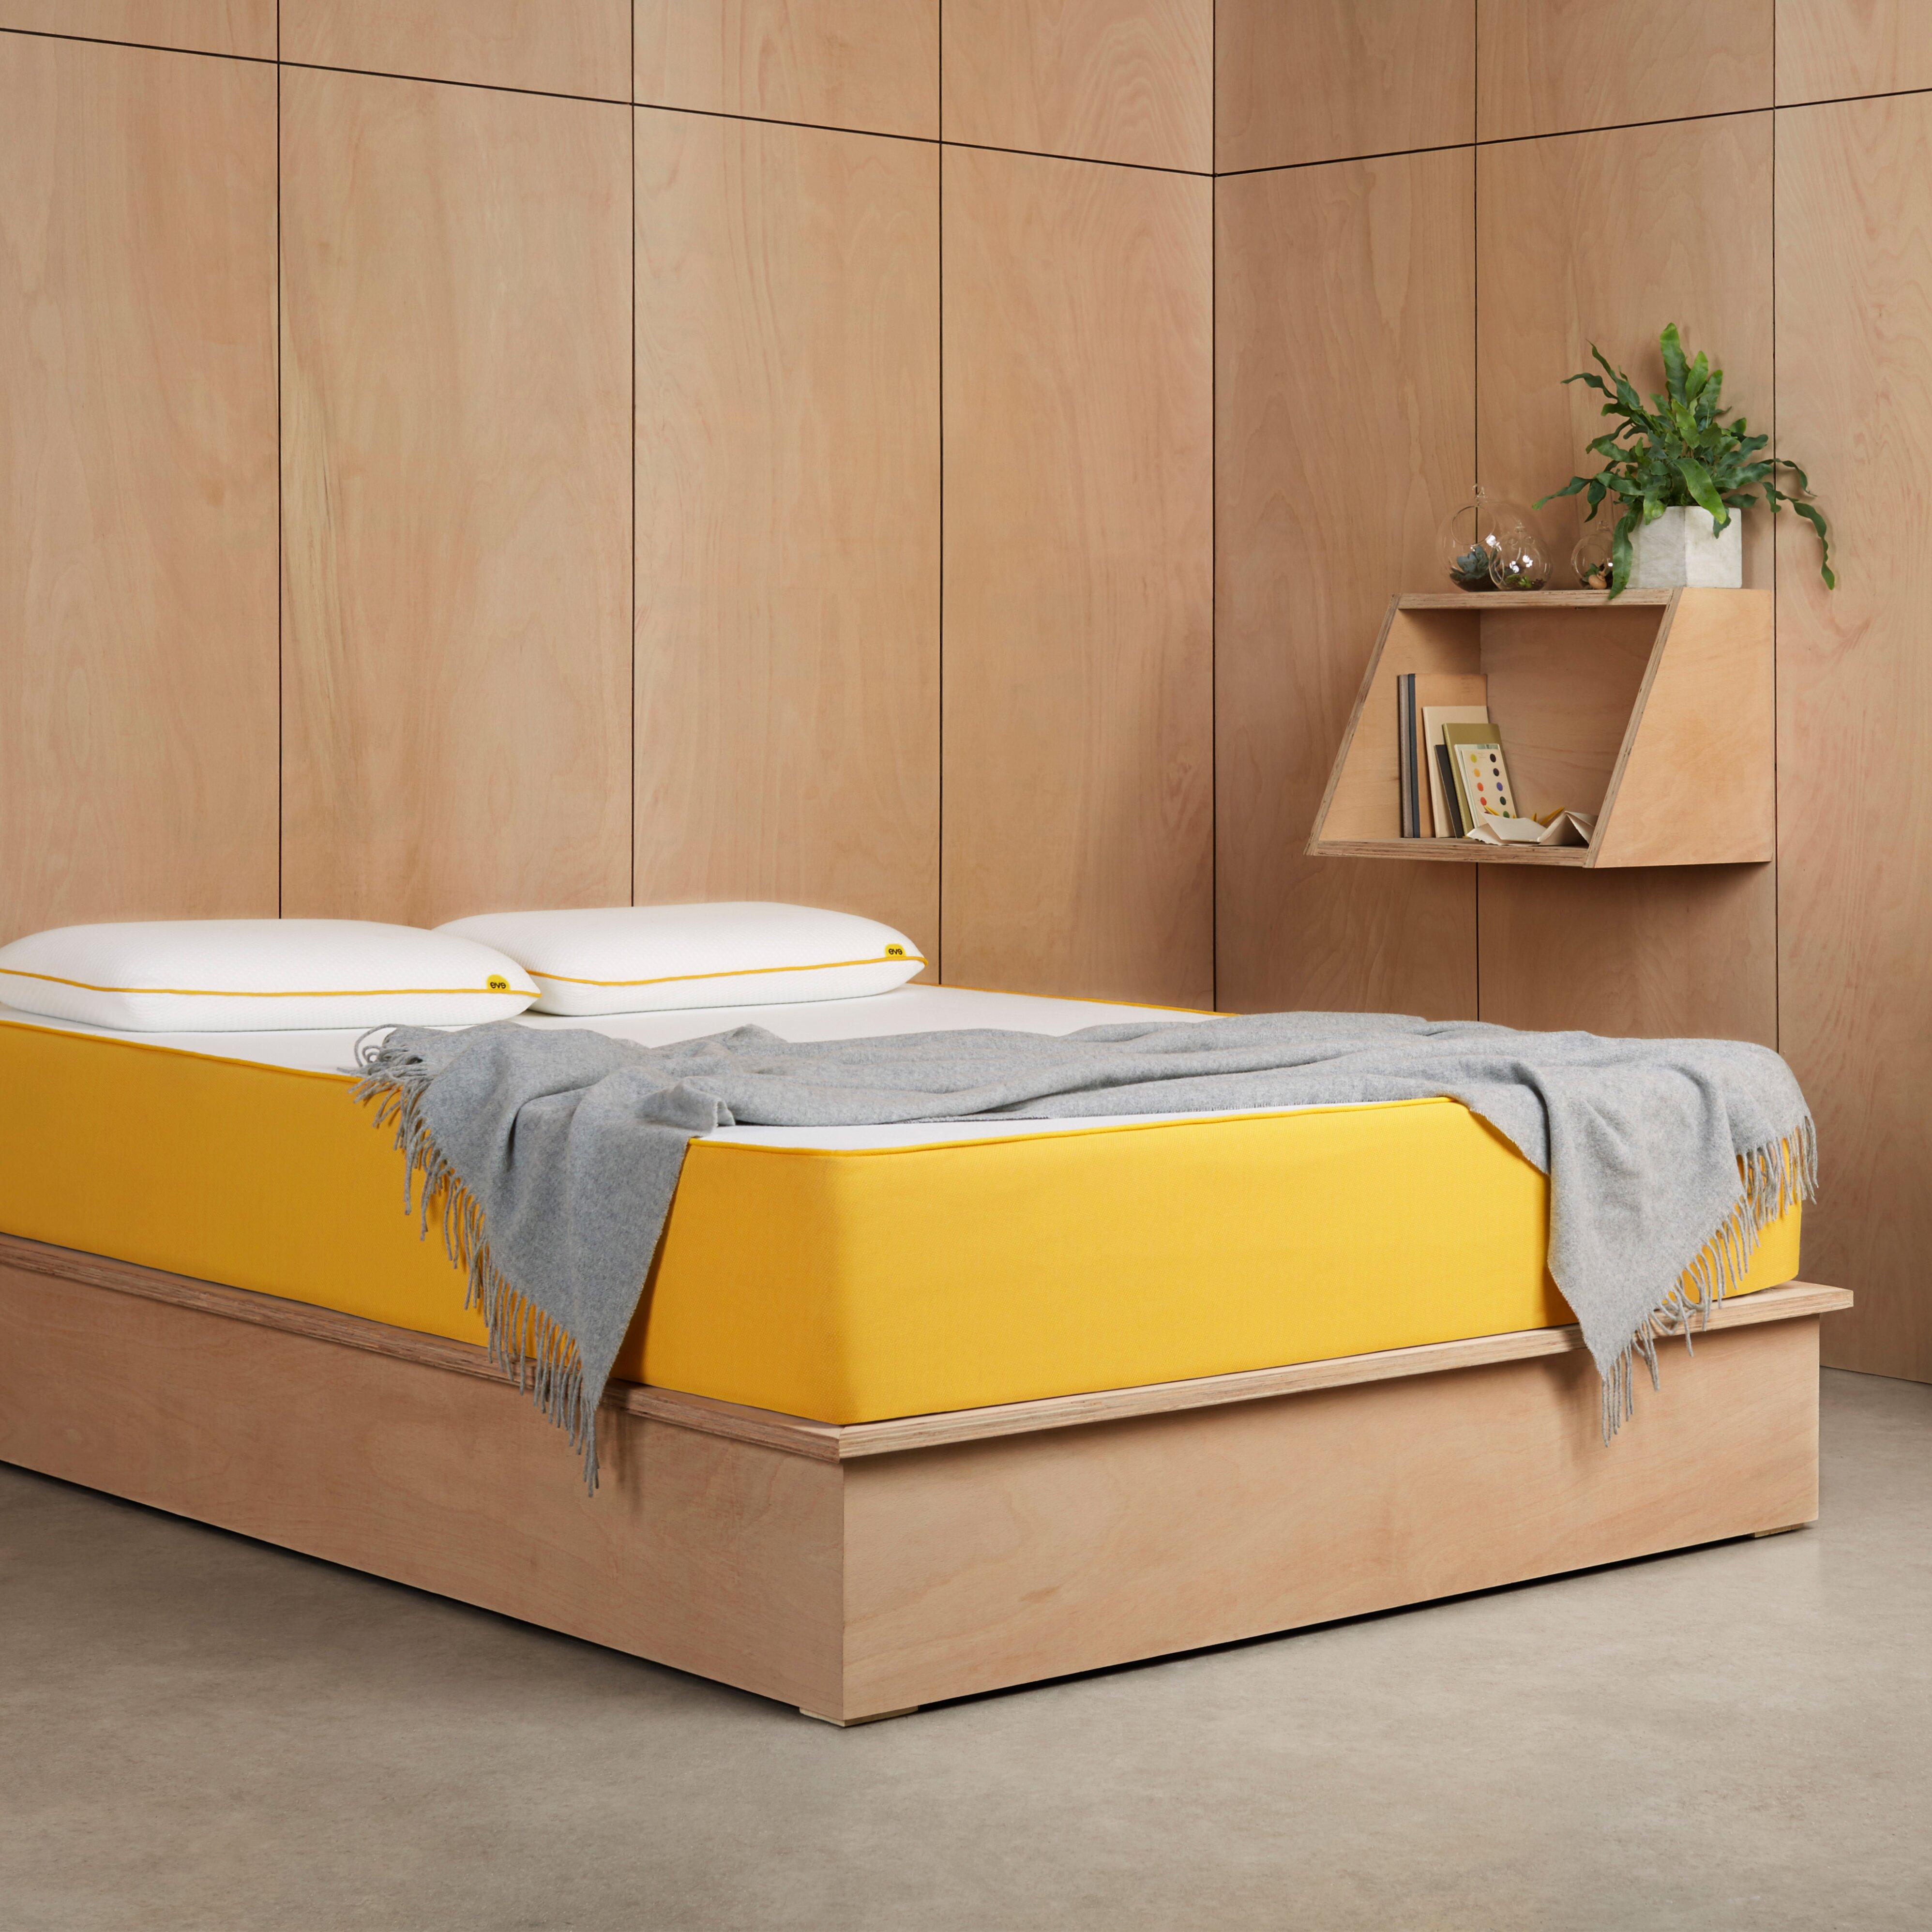 eve memory foam mattress reviews. Black Bedroom Furniture Sets. Home Design Ideas